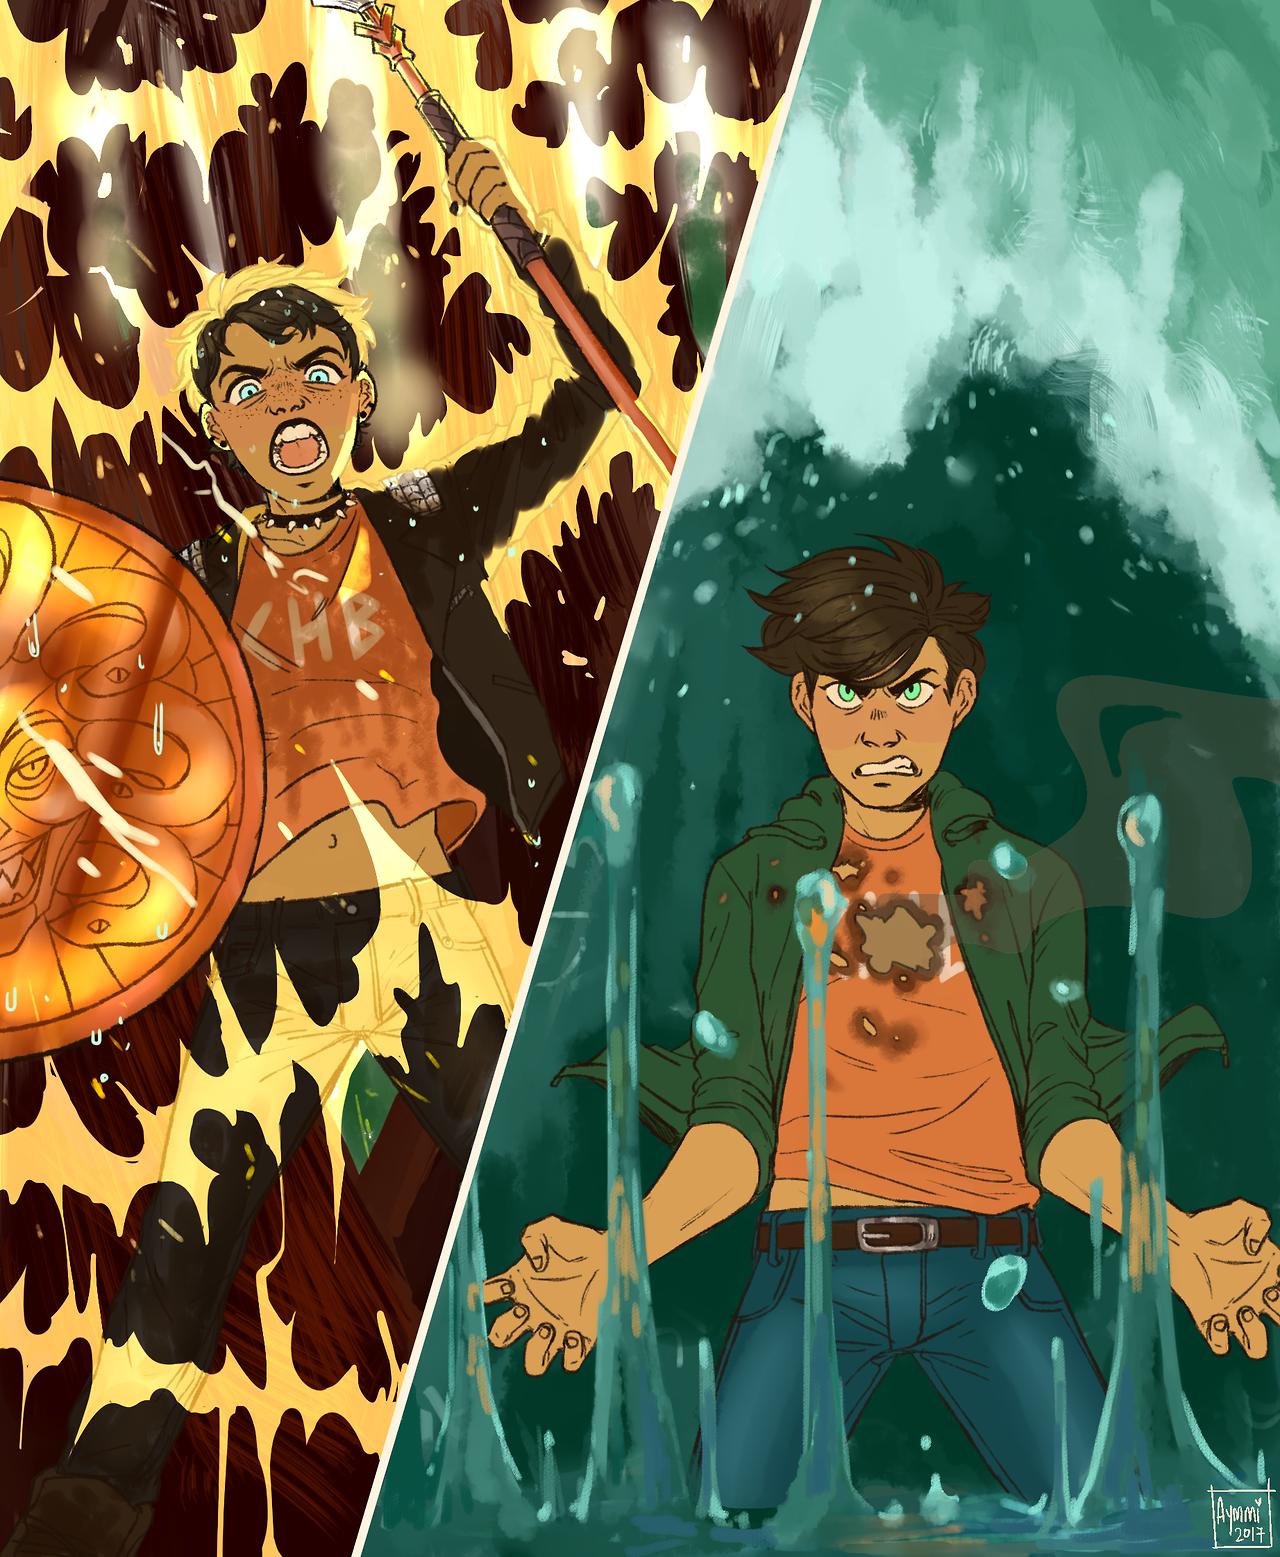 Thalia vs. Percy | Dibujos percy jackson, Libros de percy jackson ...